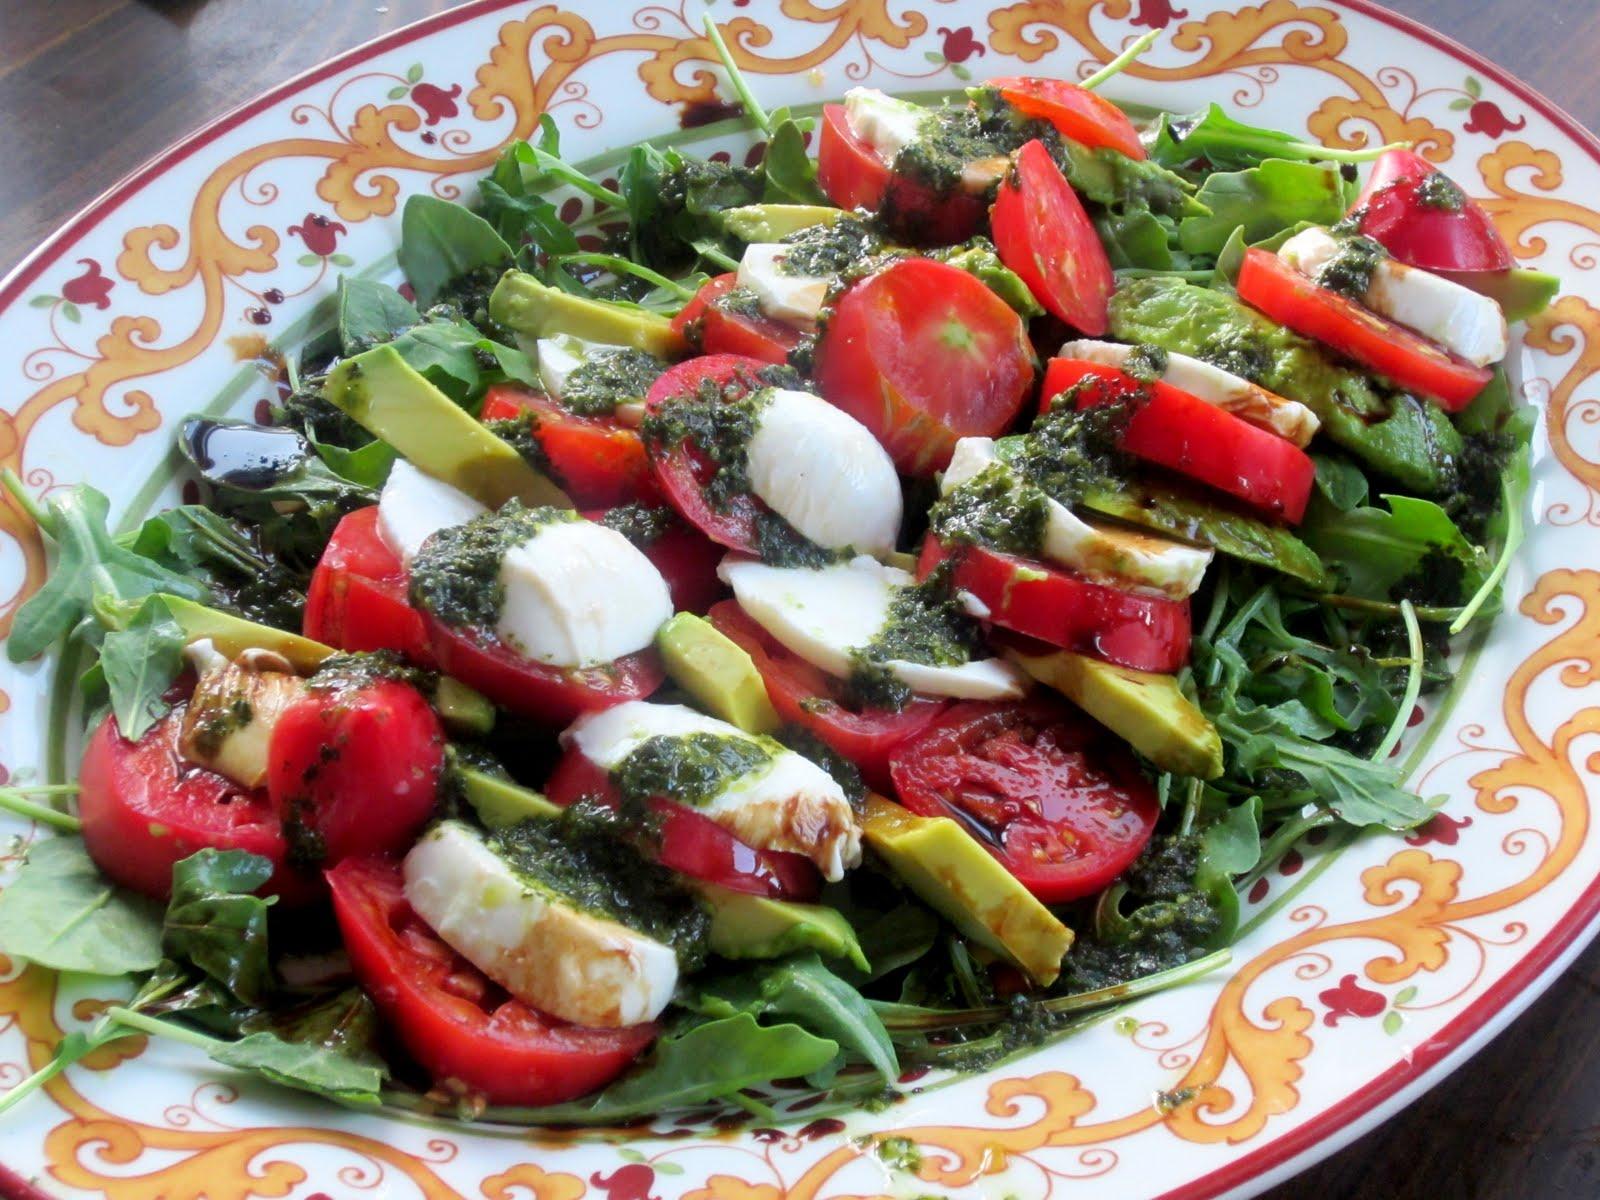 Katie's Feast: Tomato, Avocado, Arugula, and Mozzarella Salad